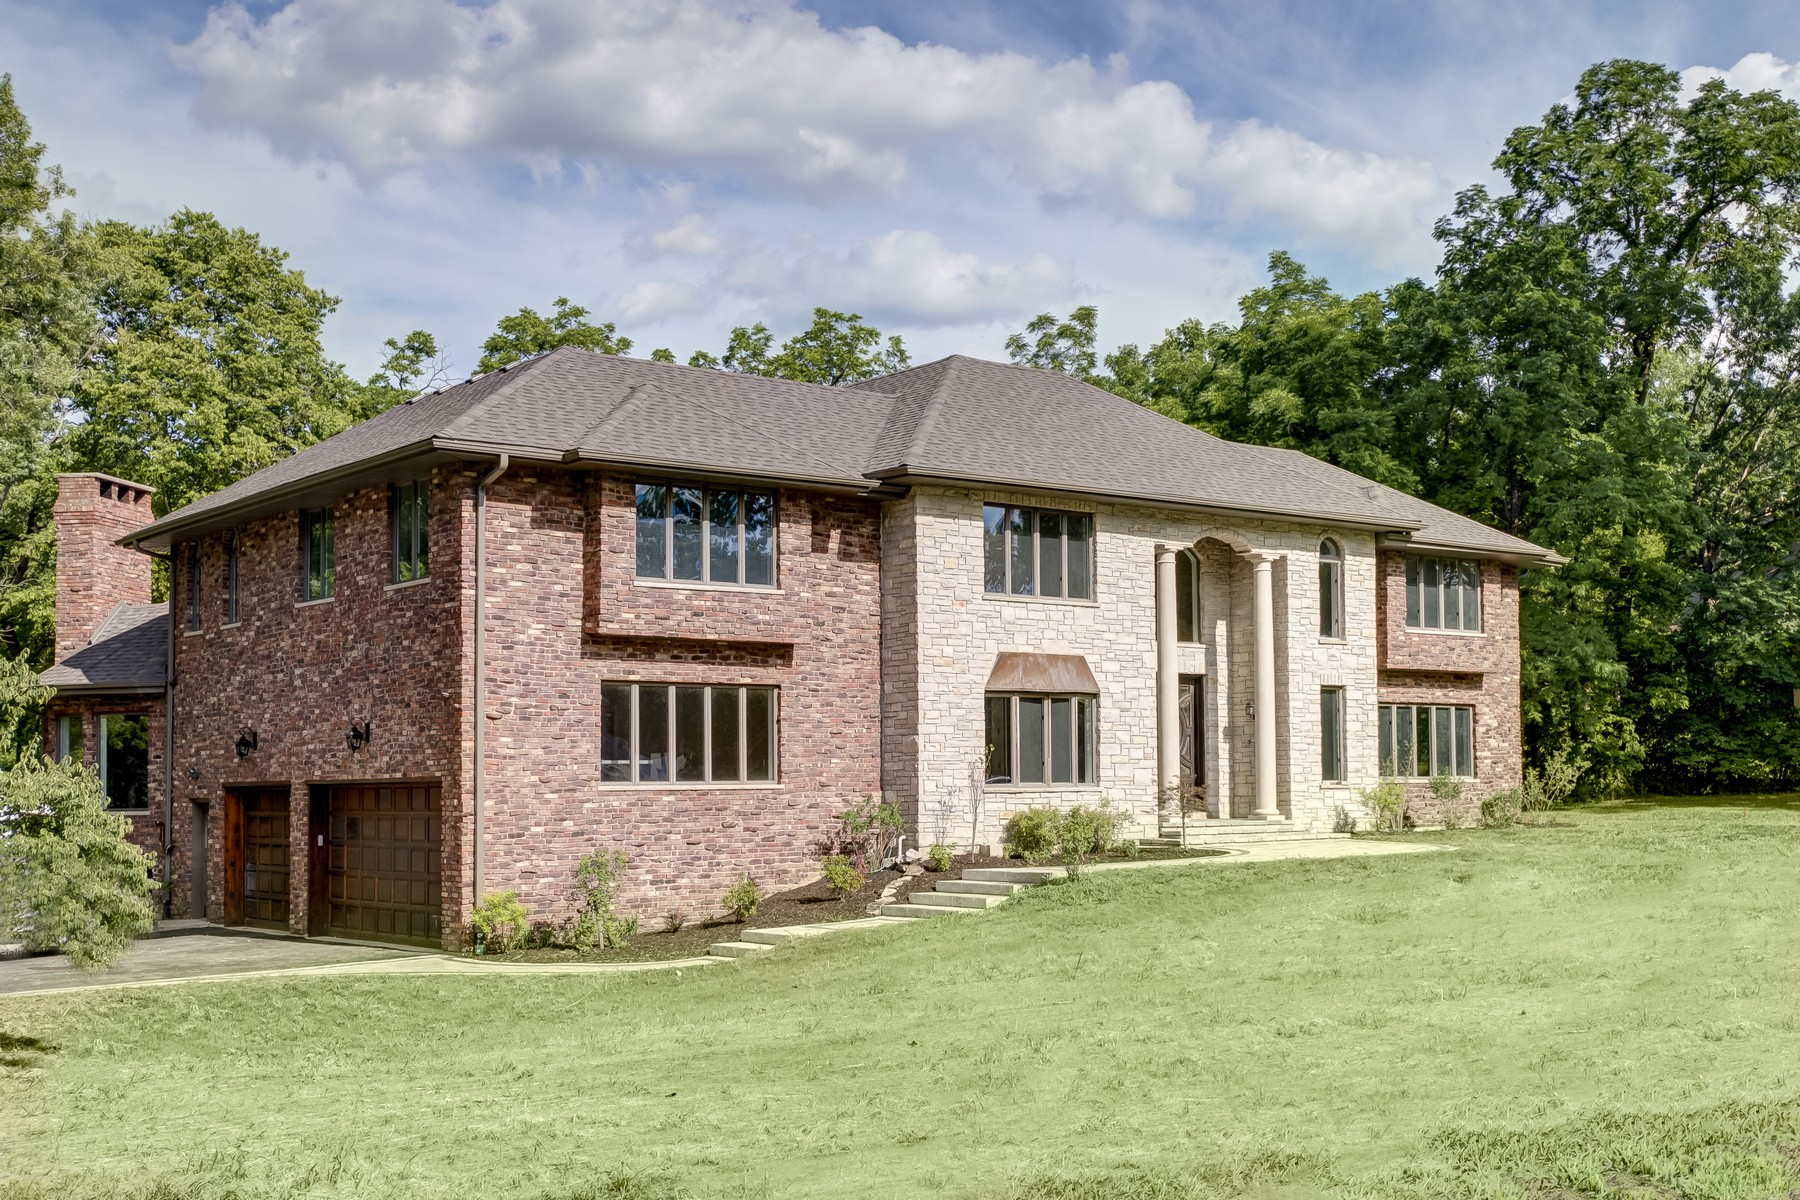 Single Family Home for Sale at Gorgeous Custom Built Home 2 Black Walnut Trail Palos Park, Illinois 60464 United States